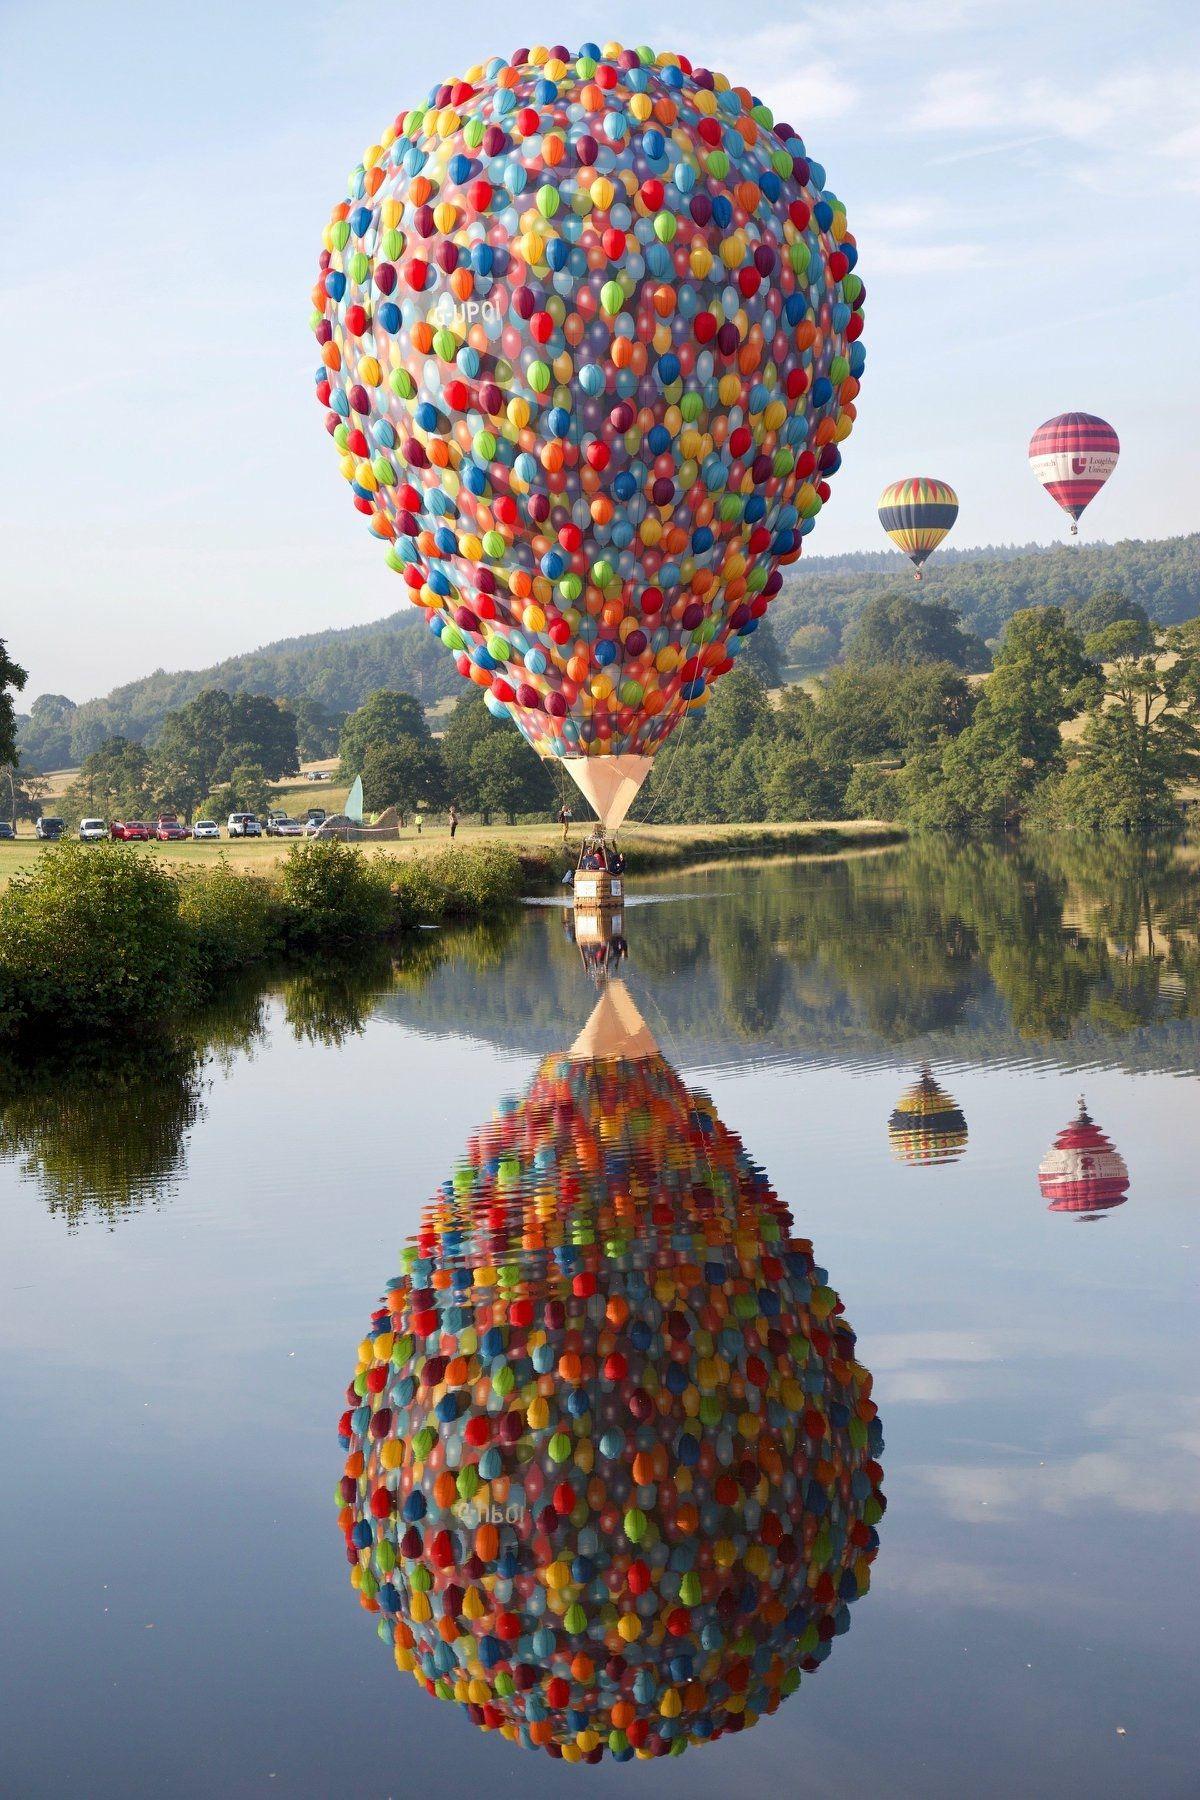 Pin by Marlon Long on Ballooning Photos in 2019 Hot air